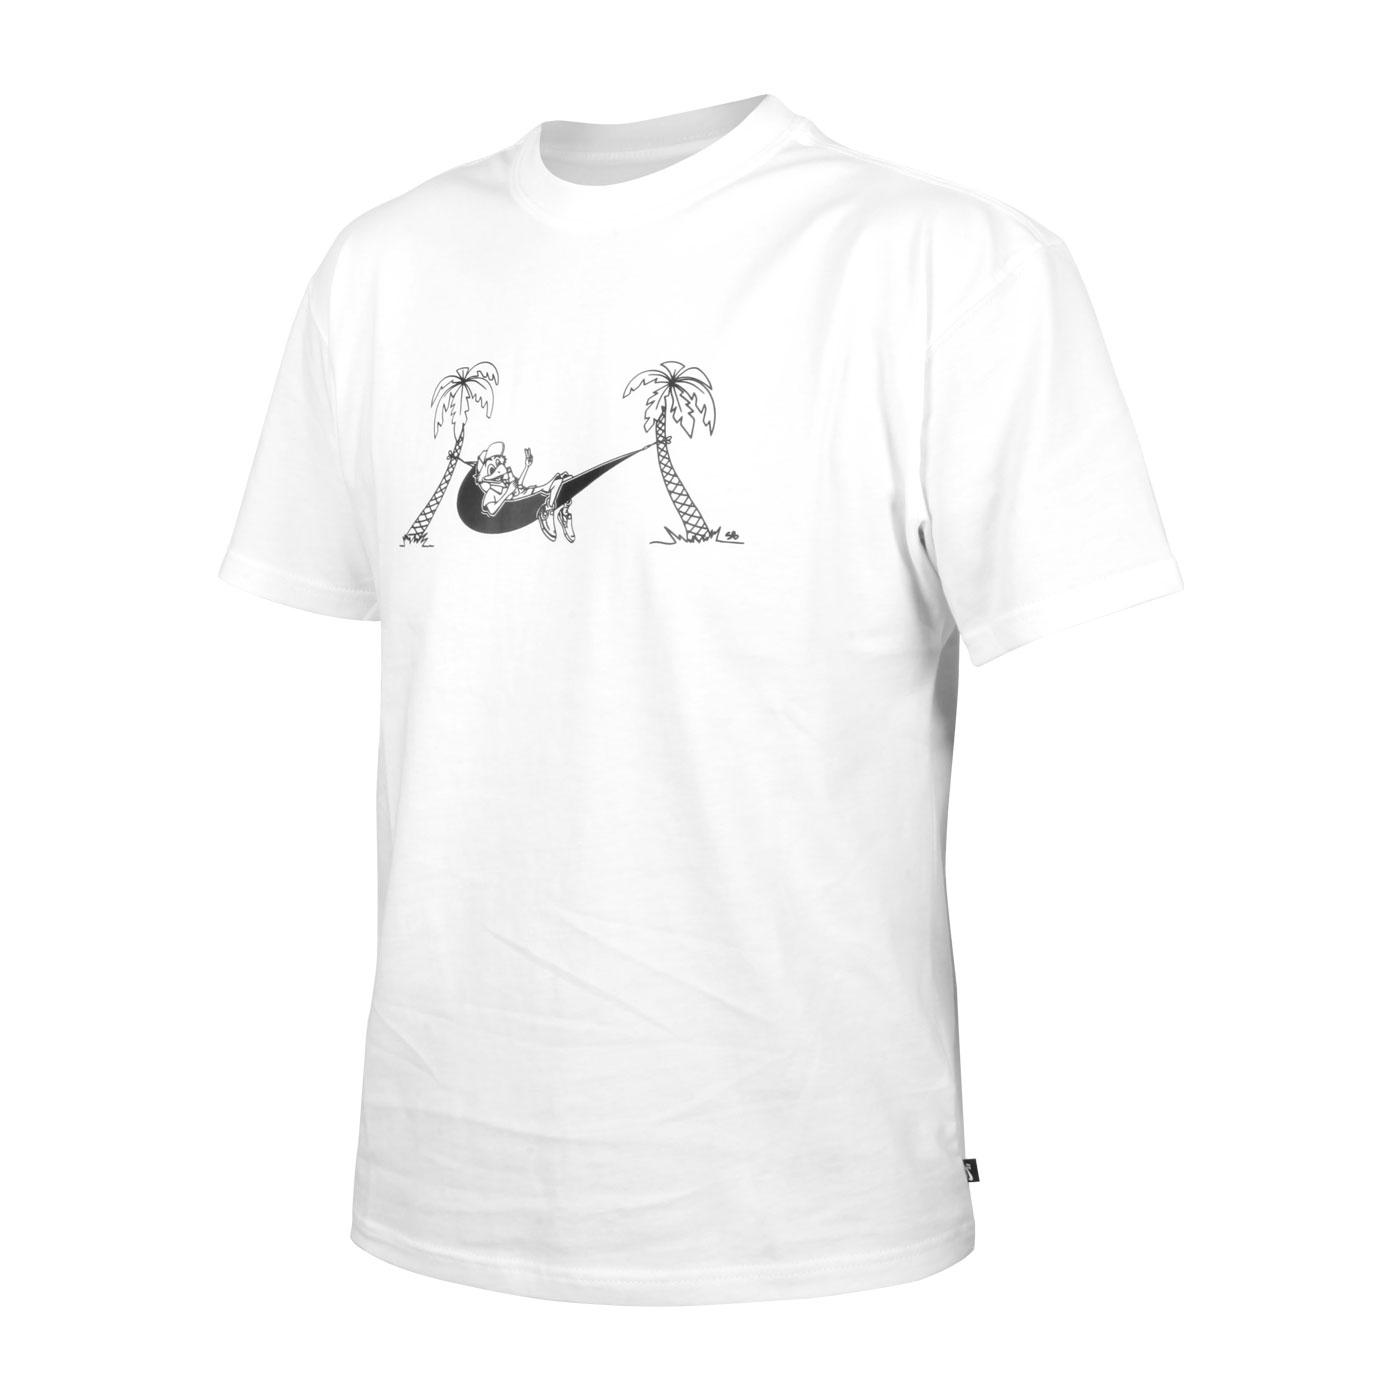 NIKE 男款短袖T恤 CZ6174-100